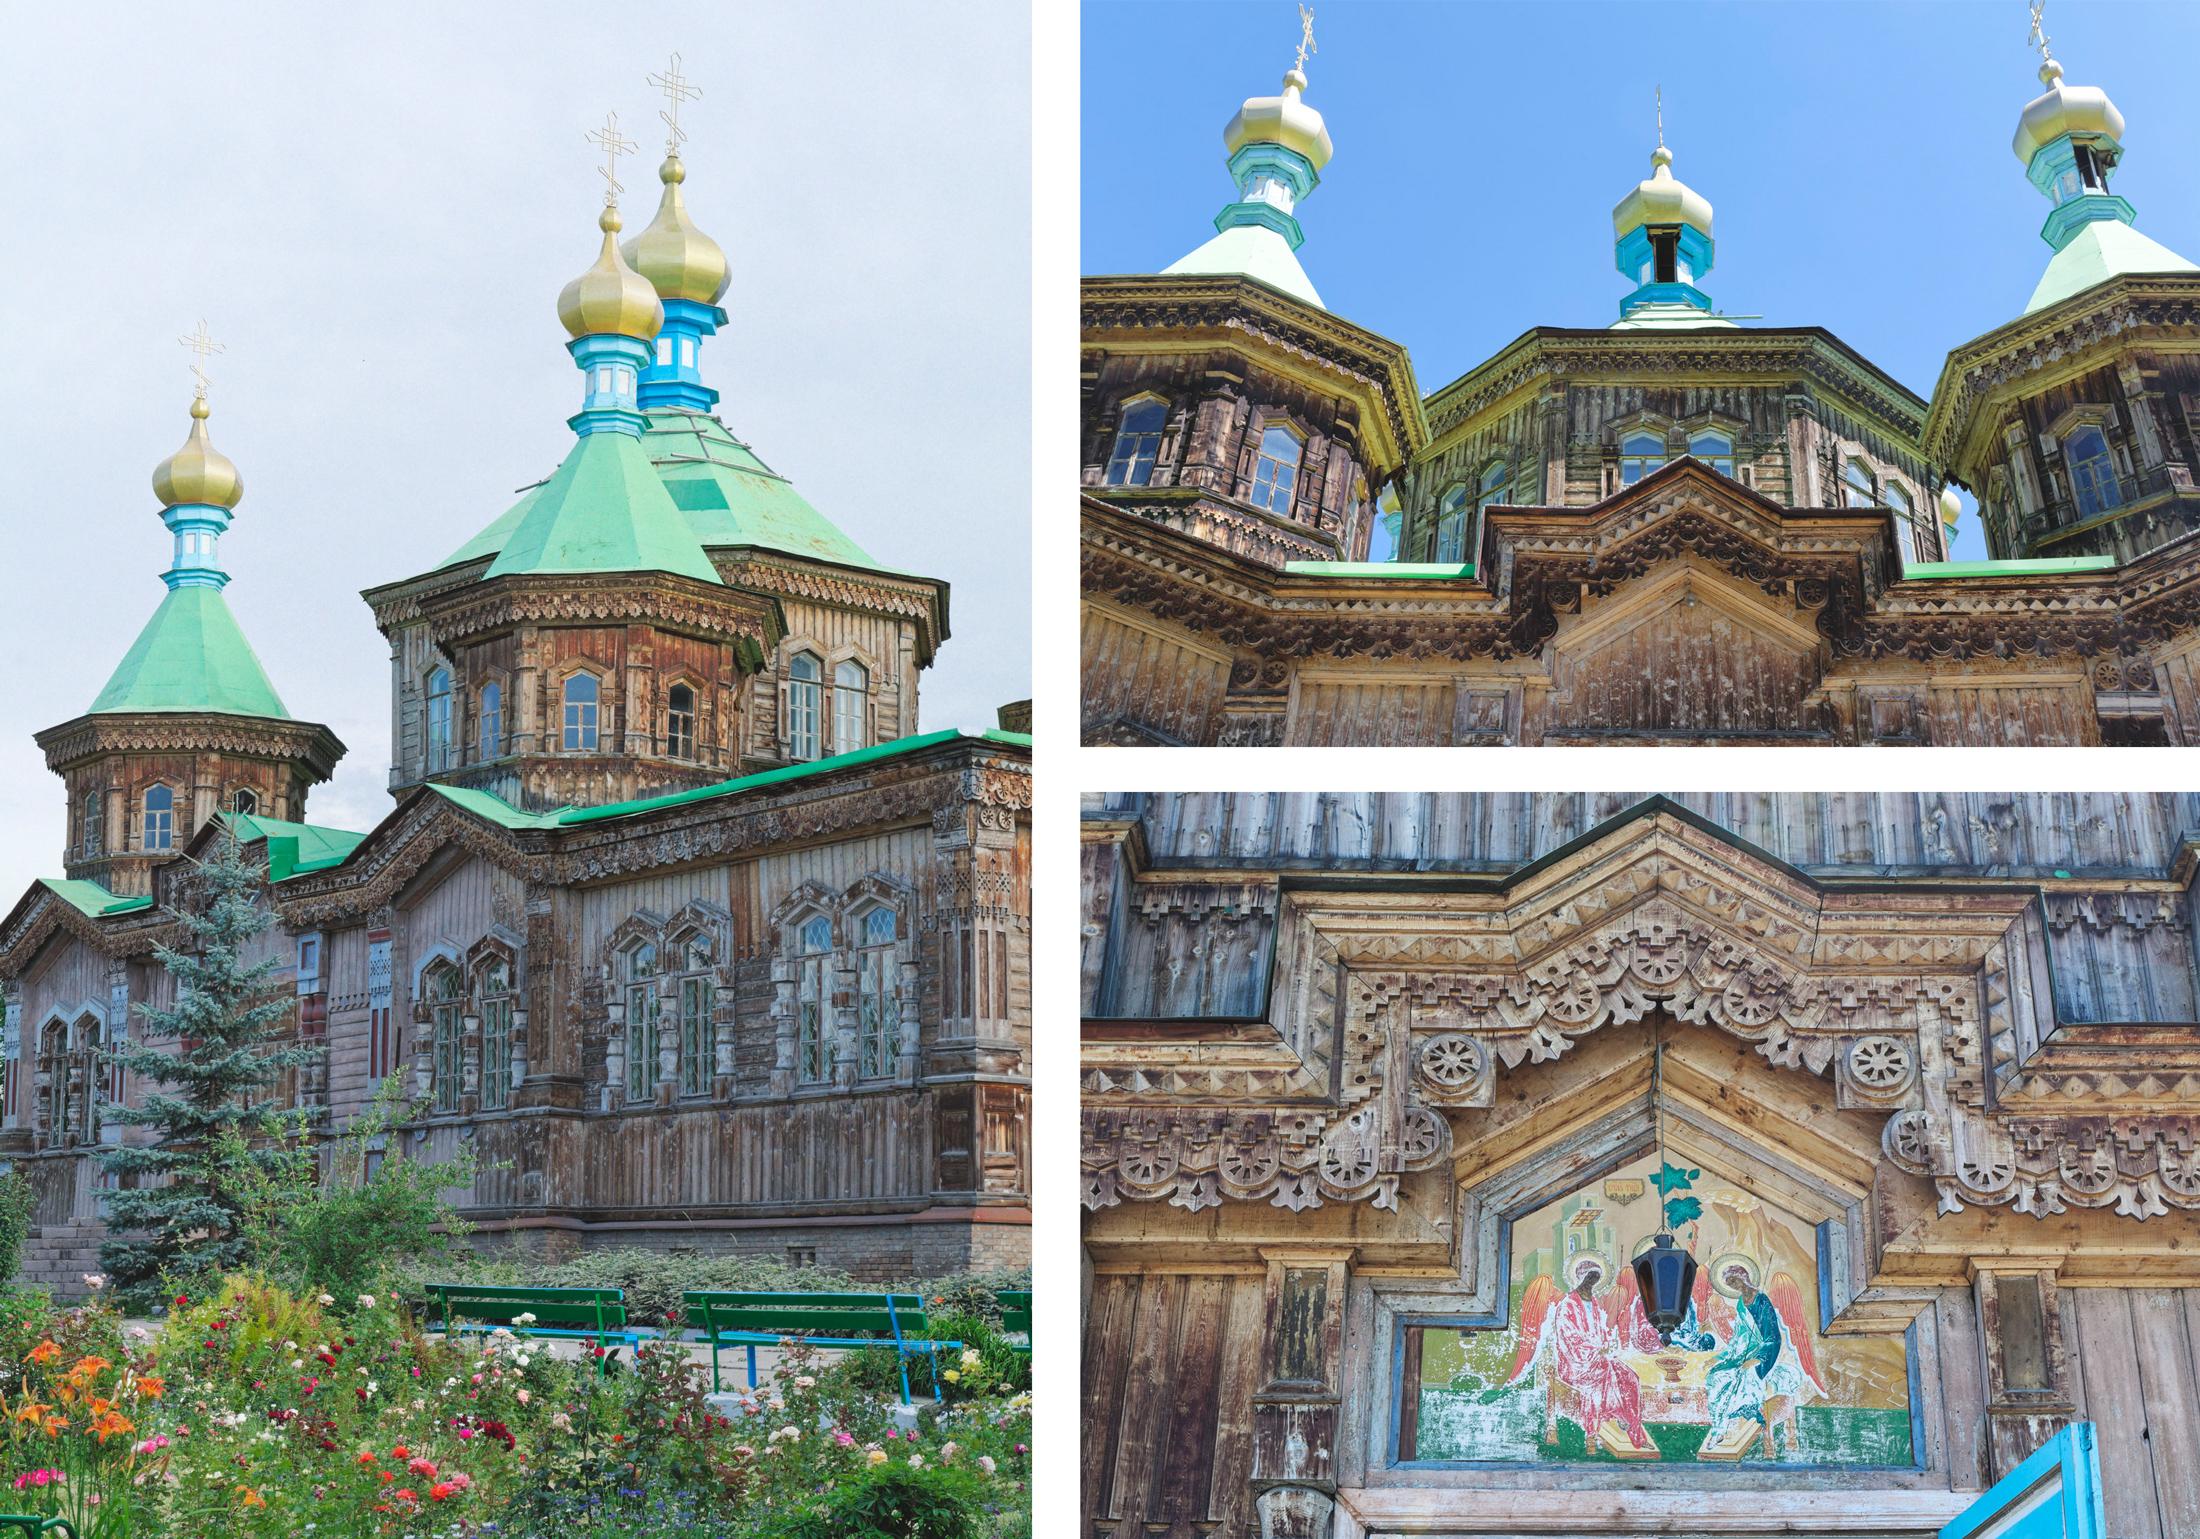 Cathédrale de la Sainte-Trinité Karakol Kirghizstan